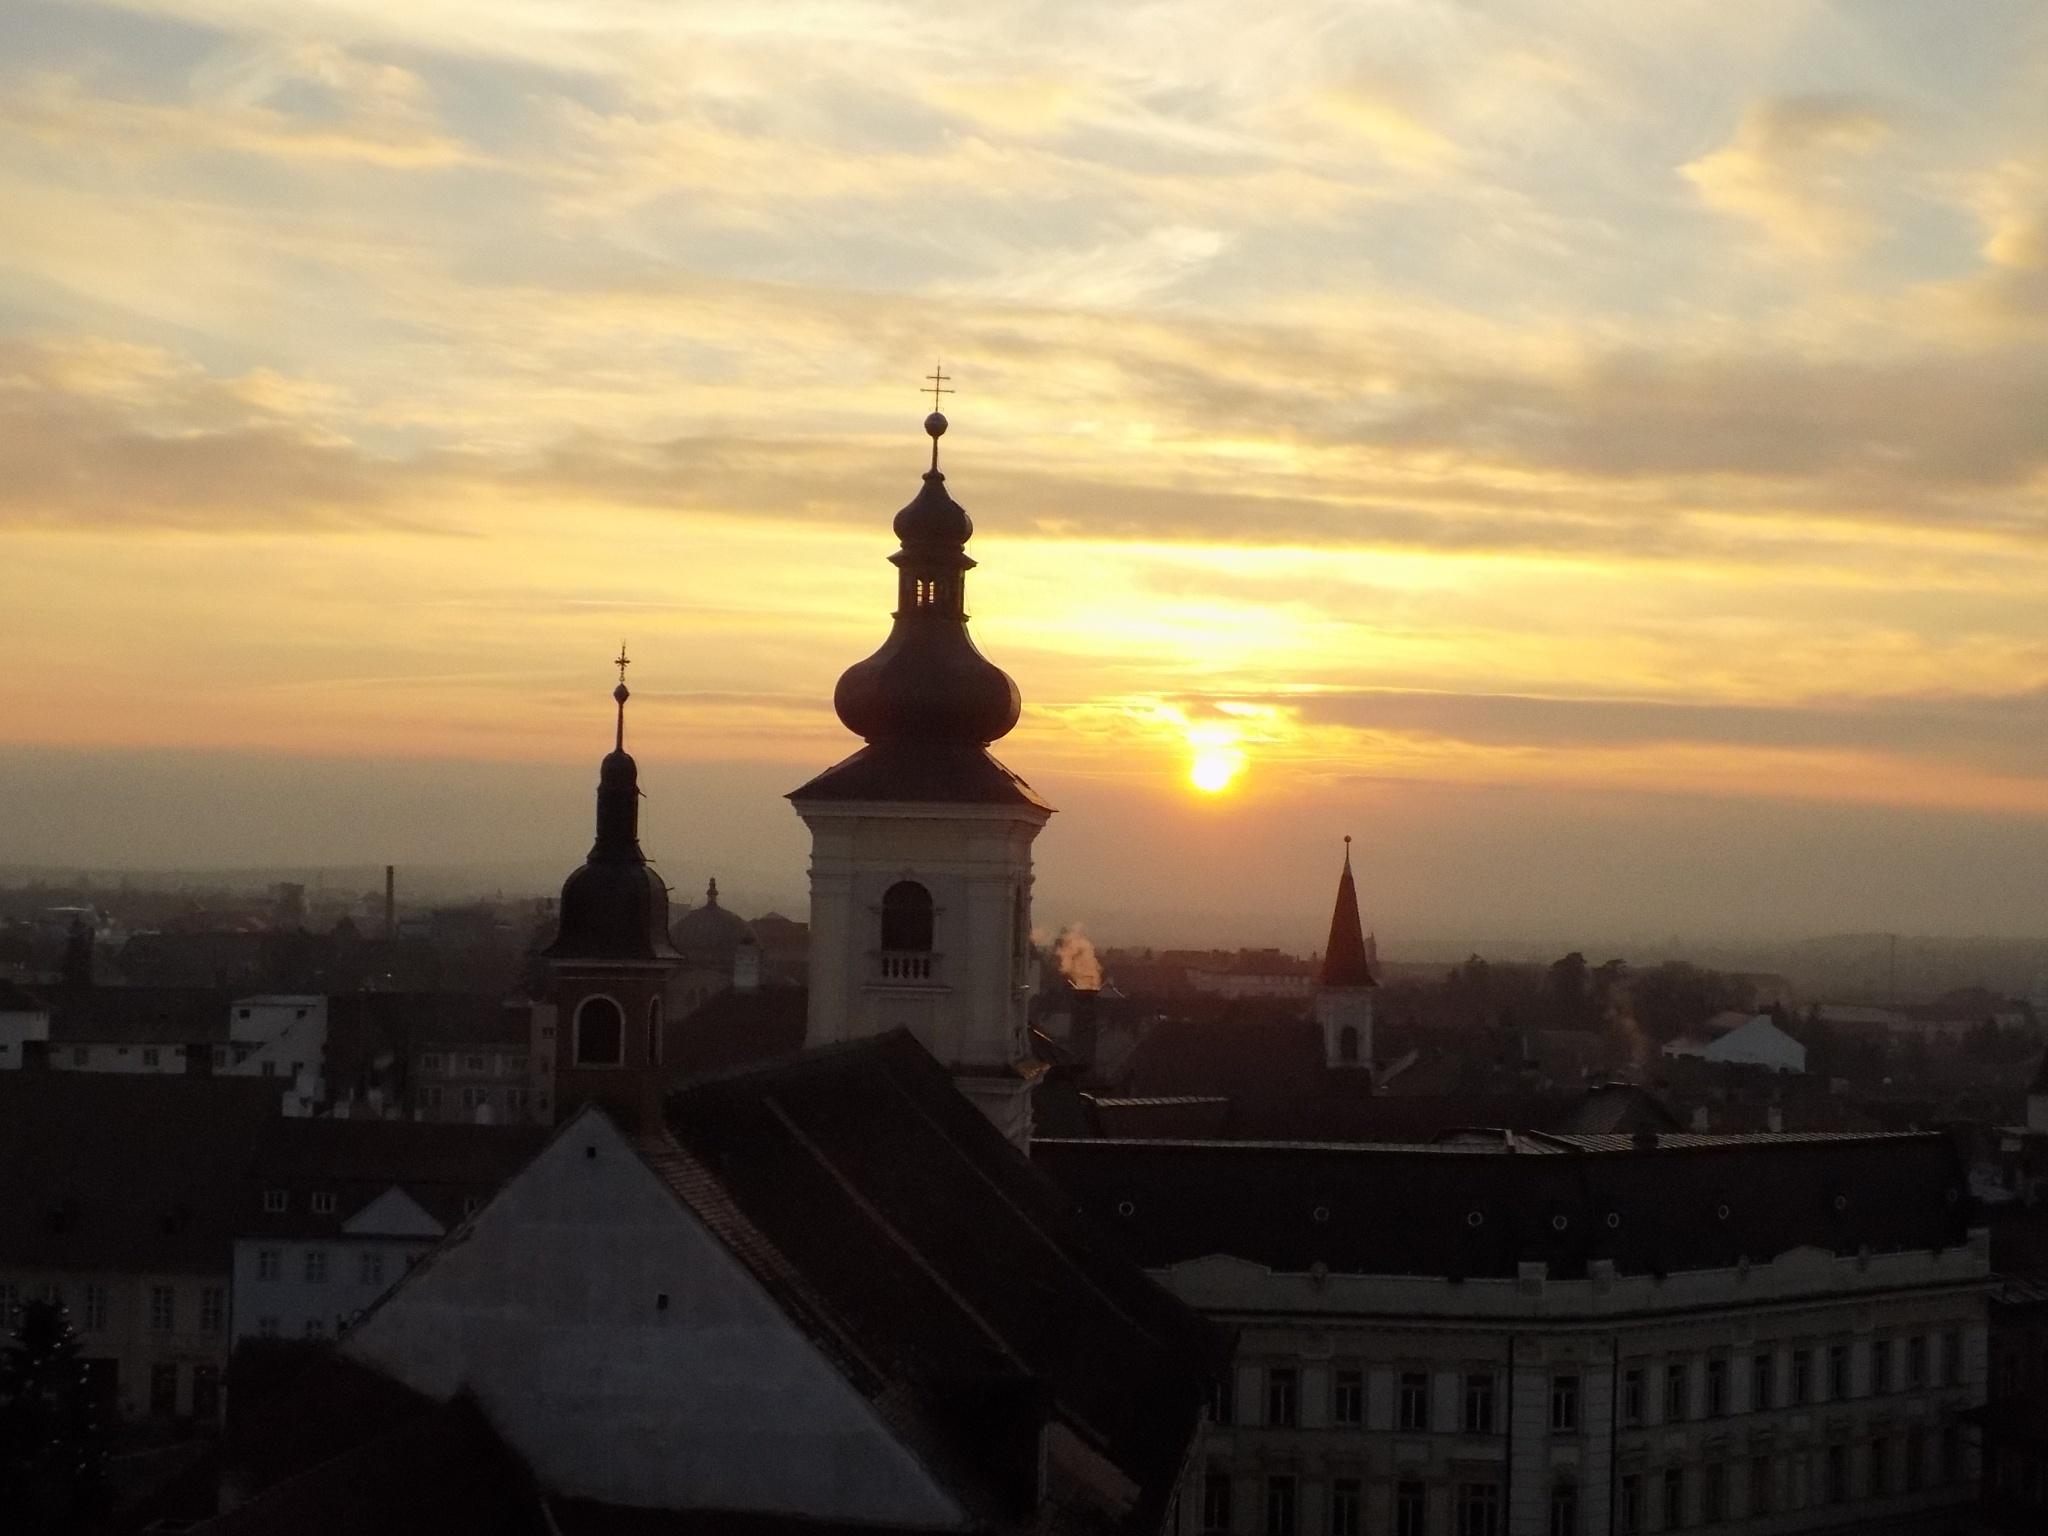 Sleeping Sibiu by MariusAndreas18